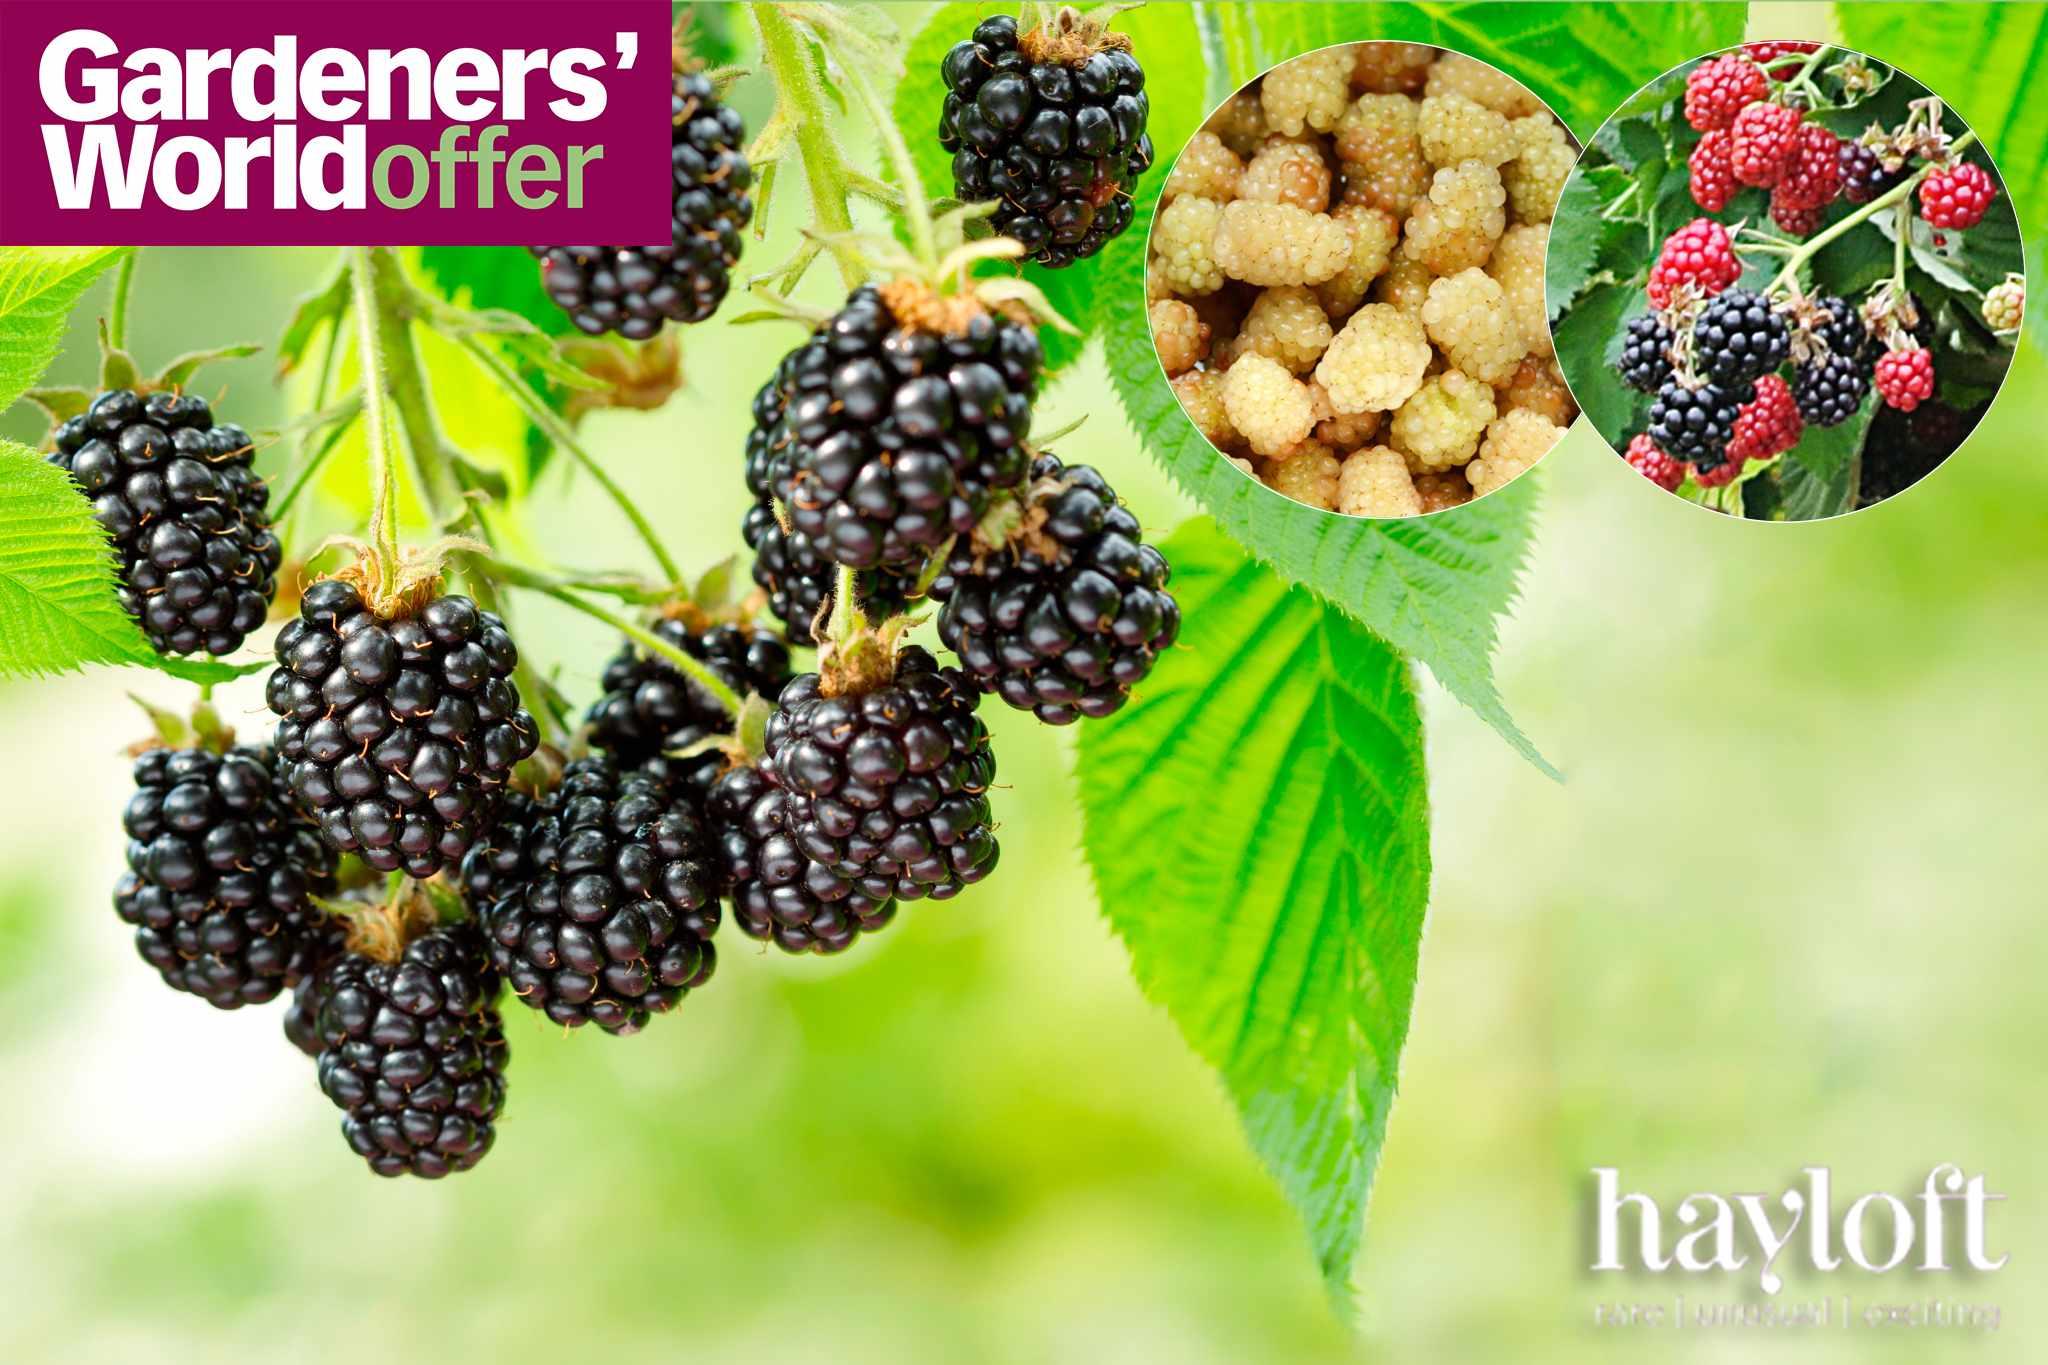 Three free blackberry plants* from Hayloft